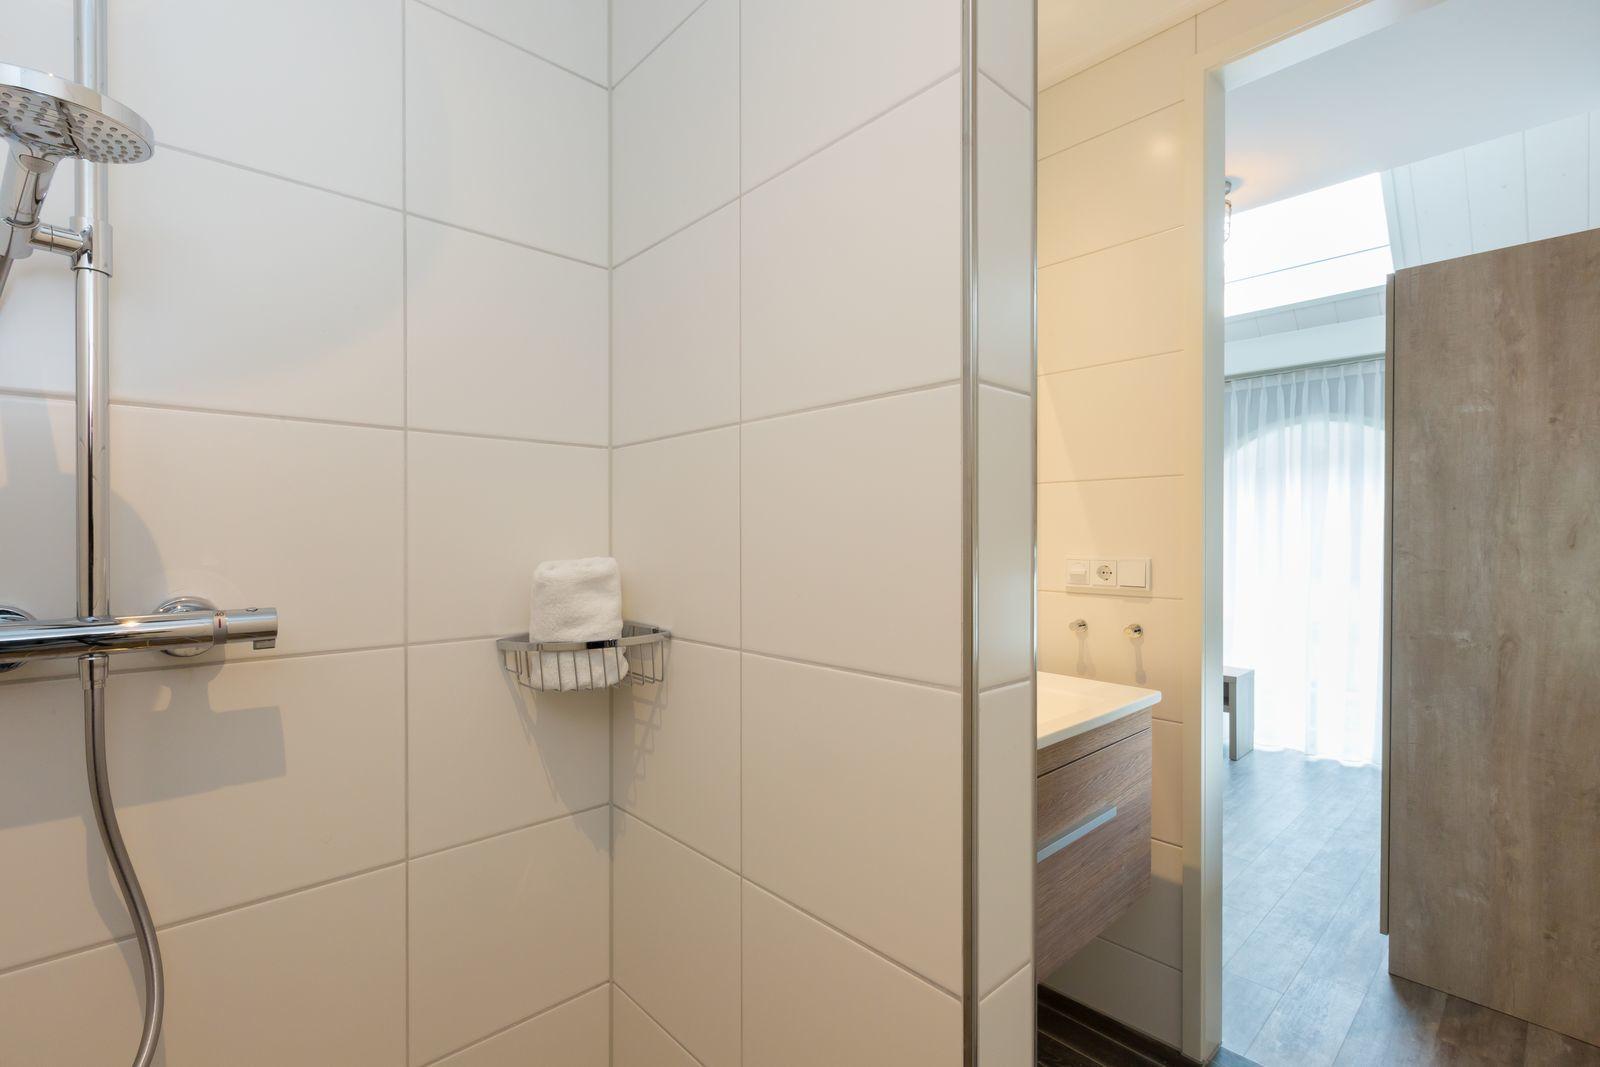 "Ferienwohnung - Noordweg 56a | Oostkapelle ""Comfort 4+ personen"""